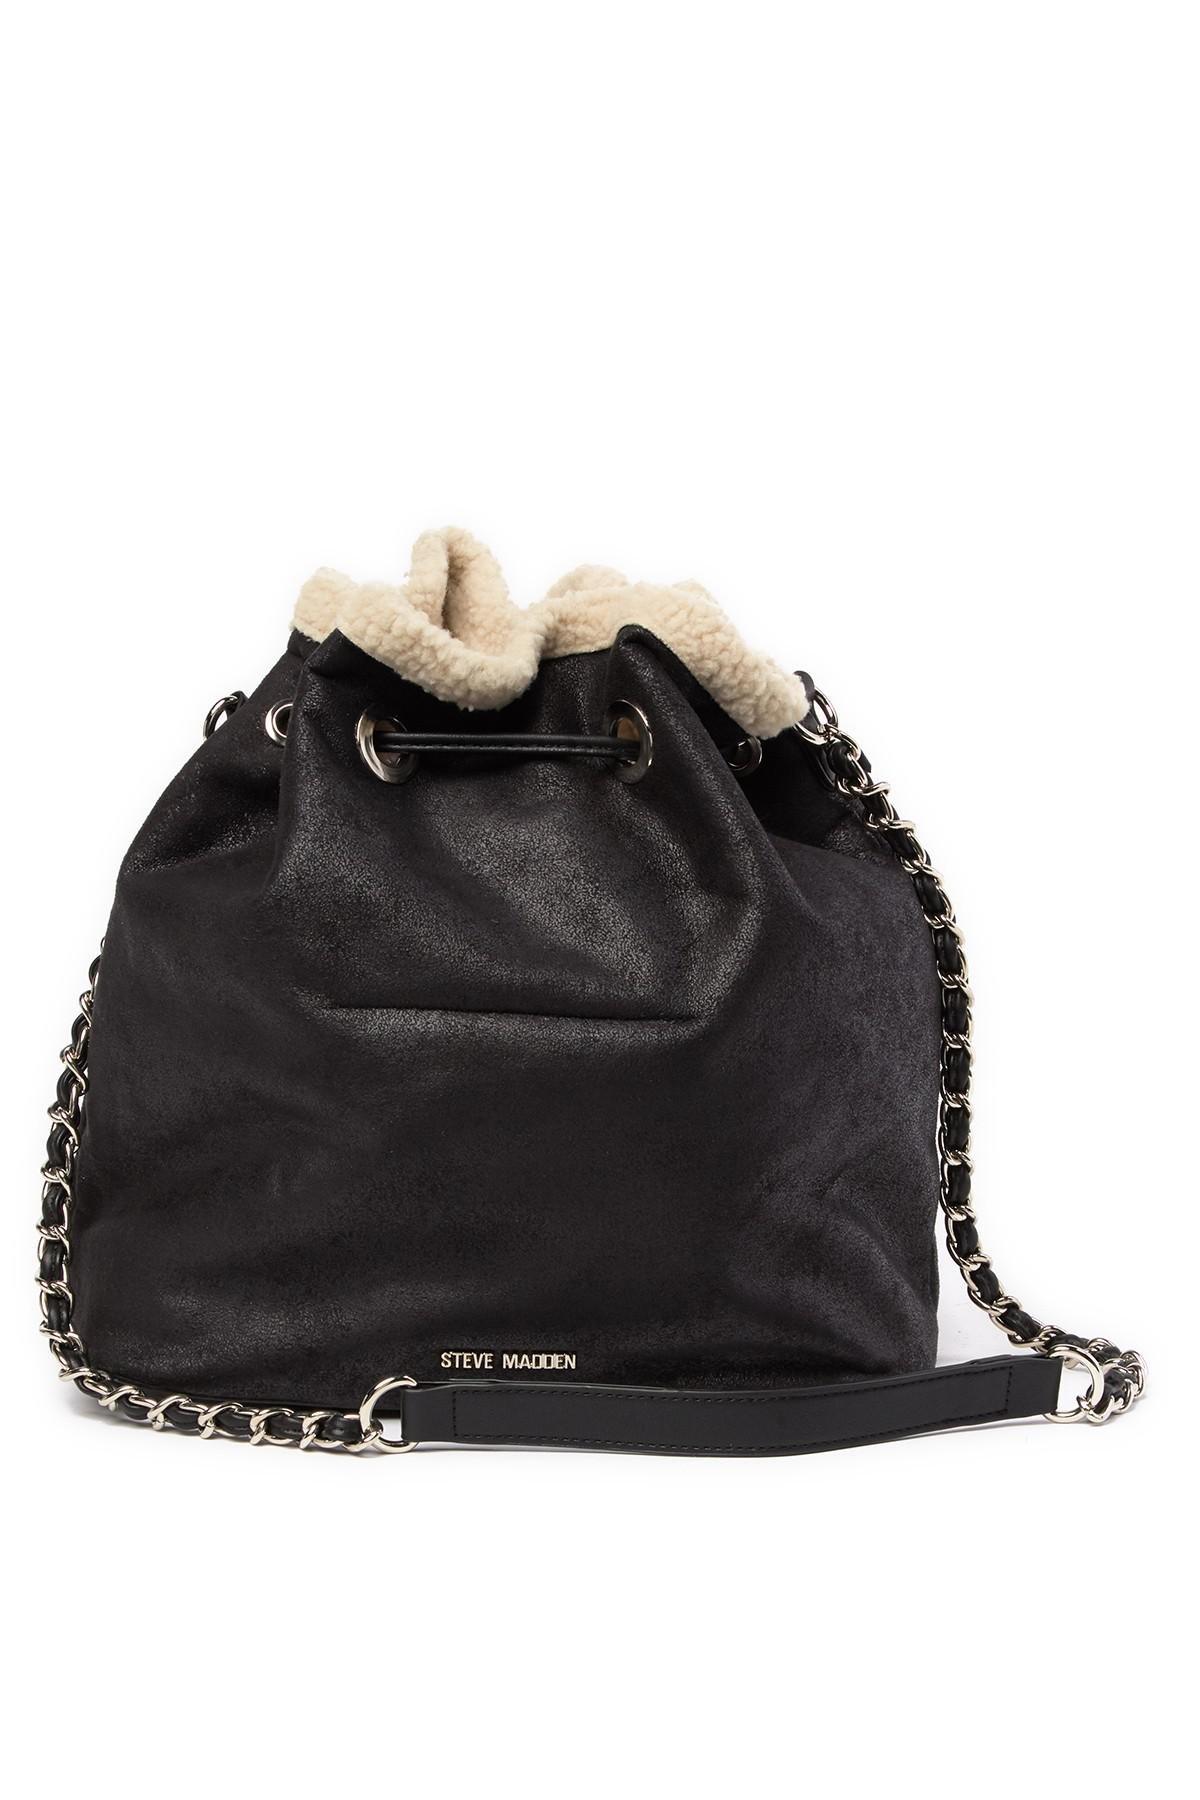 b3a0d0d8af Steve Madden - Natural Bucket Faux Fur Lined Shoulder Bag - Lyst. View  fullscreen